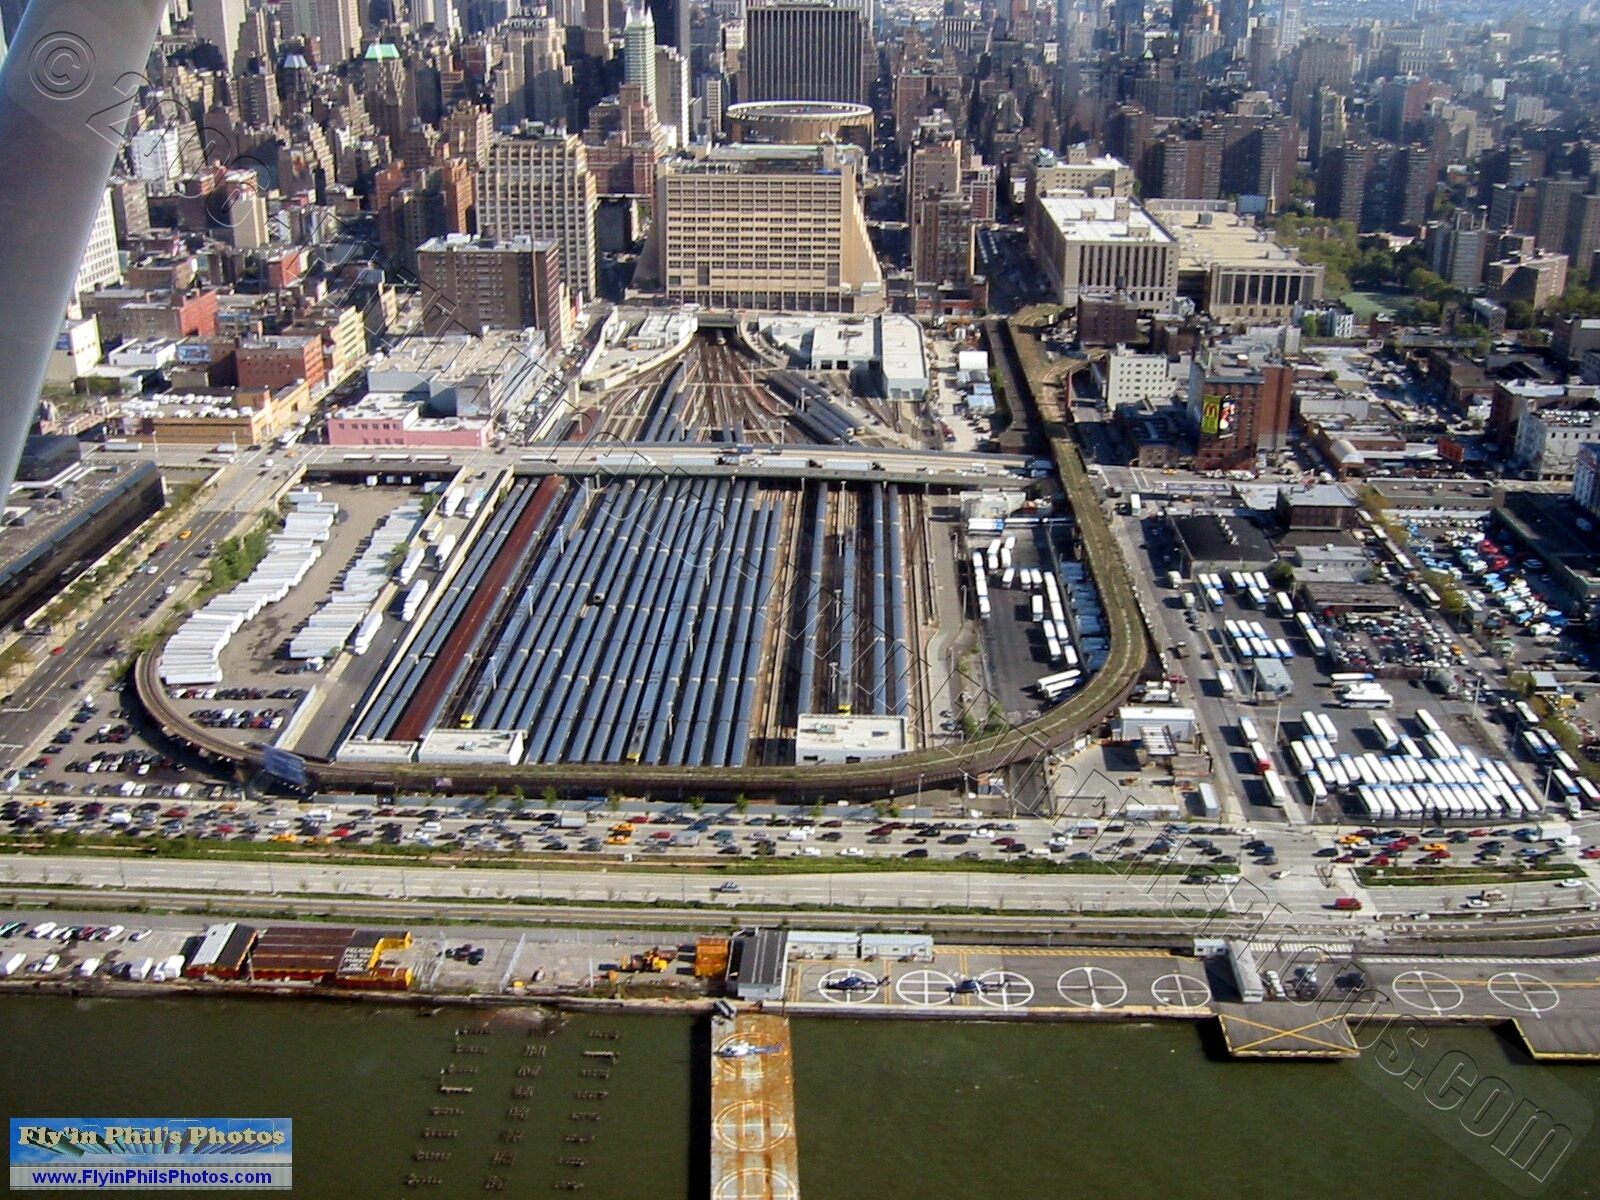 0022 Grand Central Station, Manhattan 0023 Empire State Building, Manhattan 0024 Intrepid Sea, Air & Space Museum, Manhattan